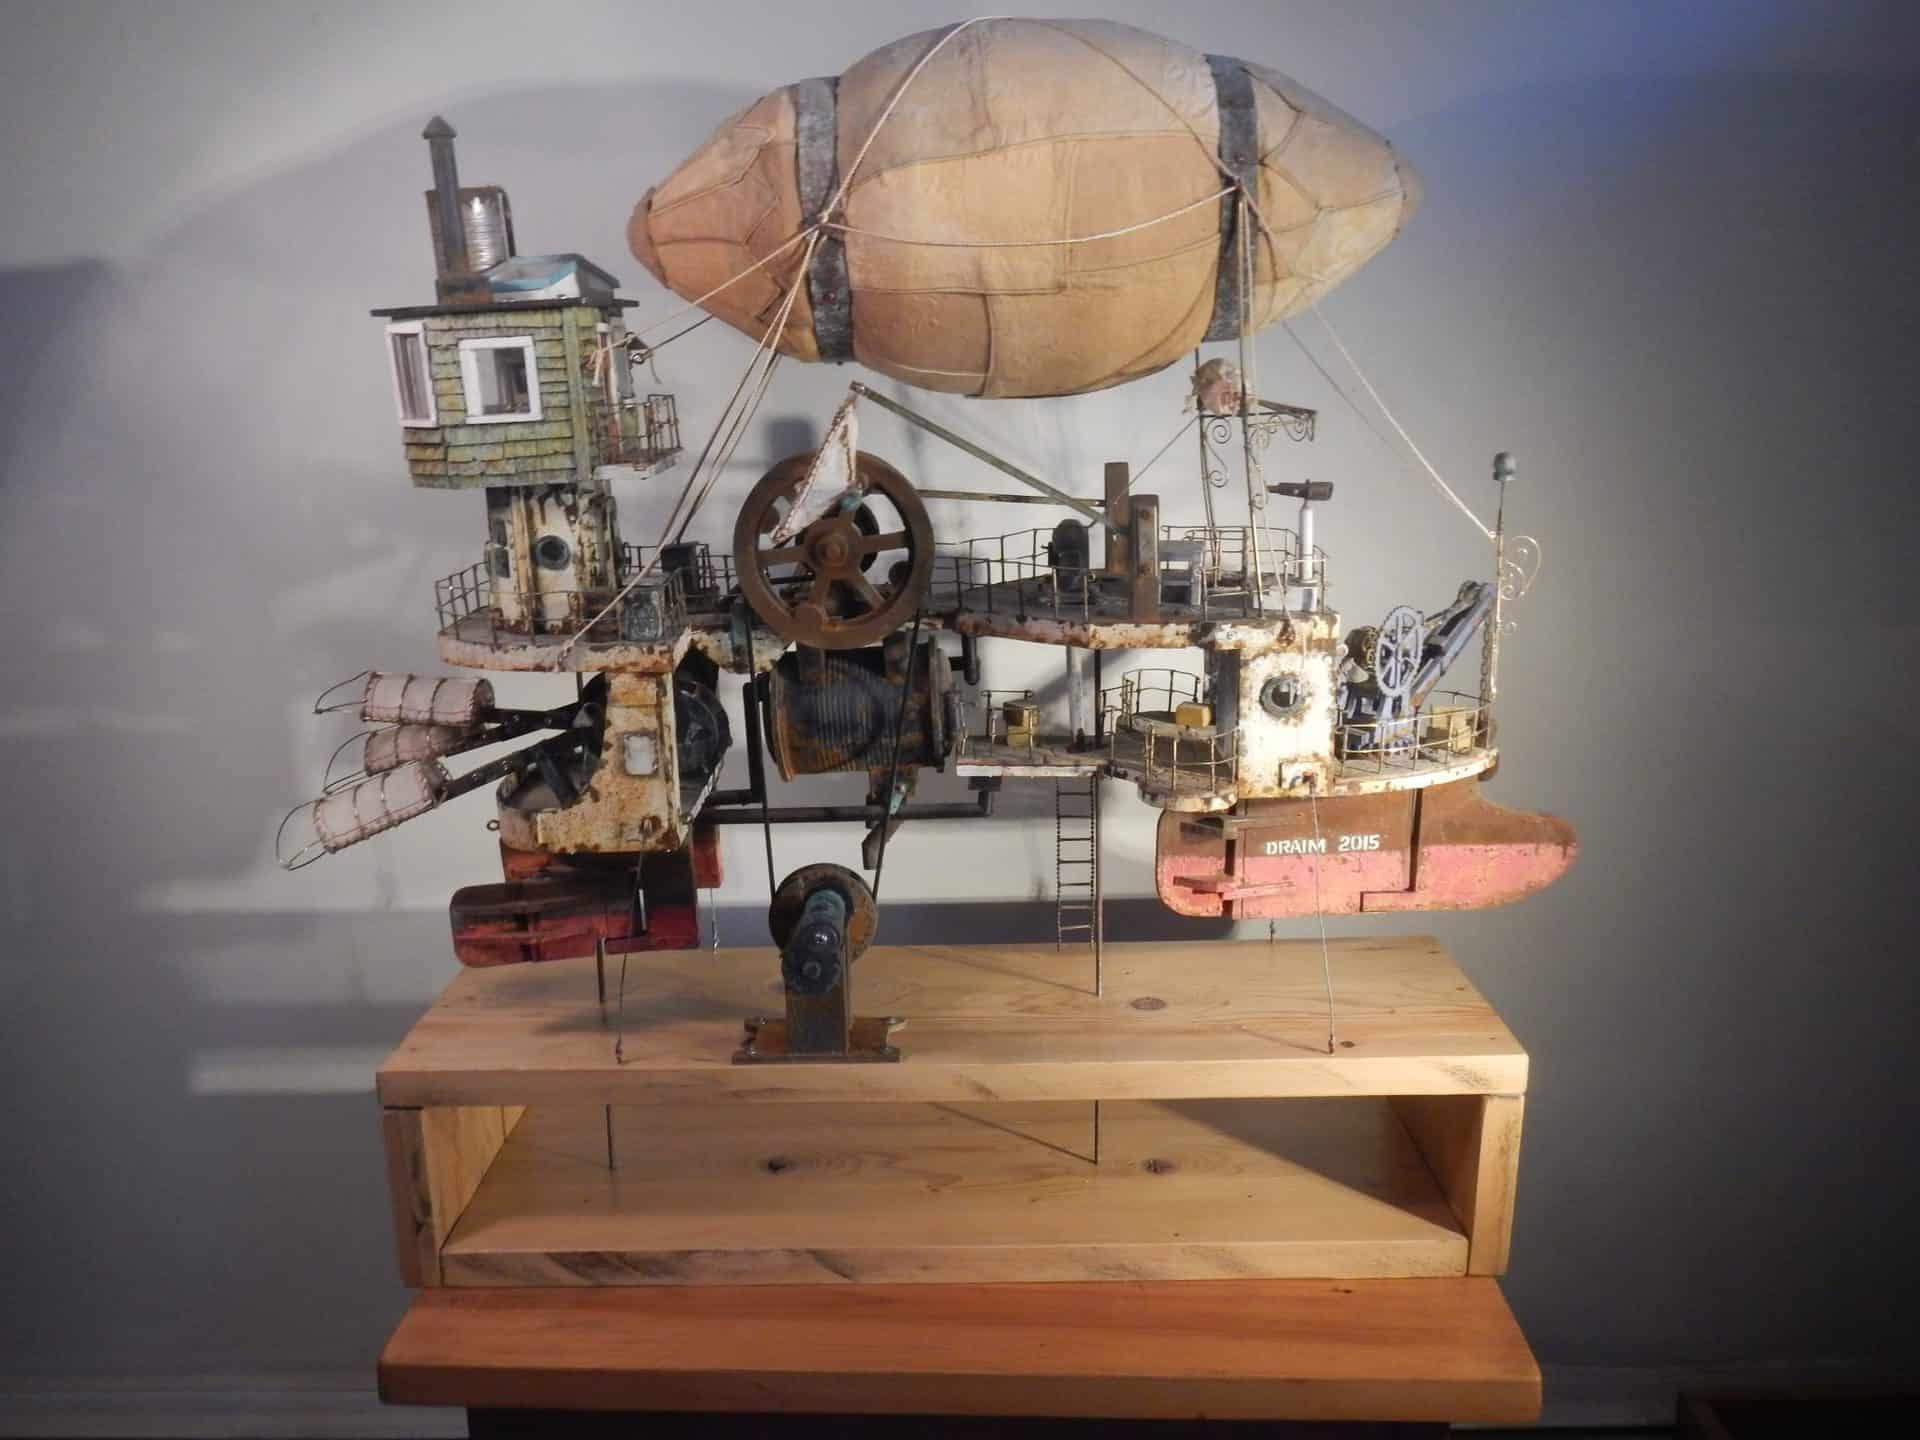 Steampunk Ken Draim - The Flying Machine, 2015